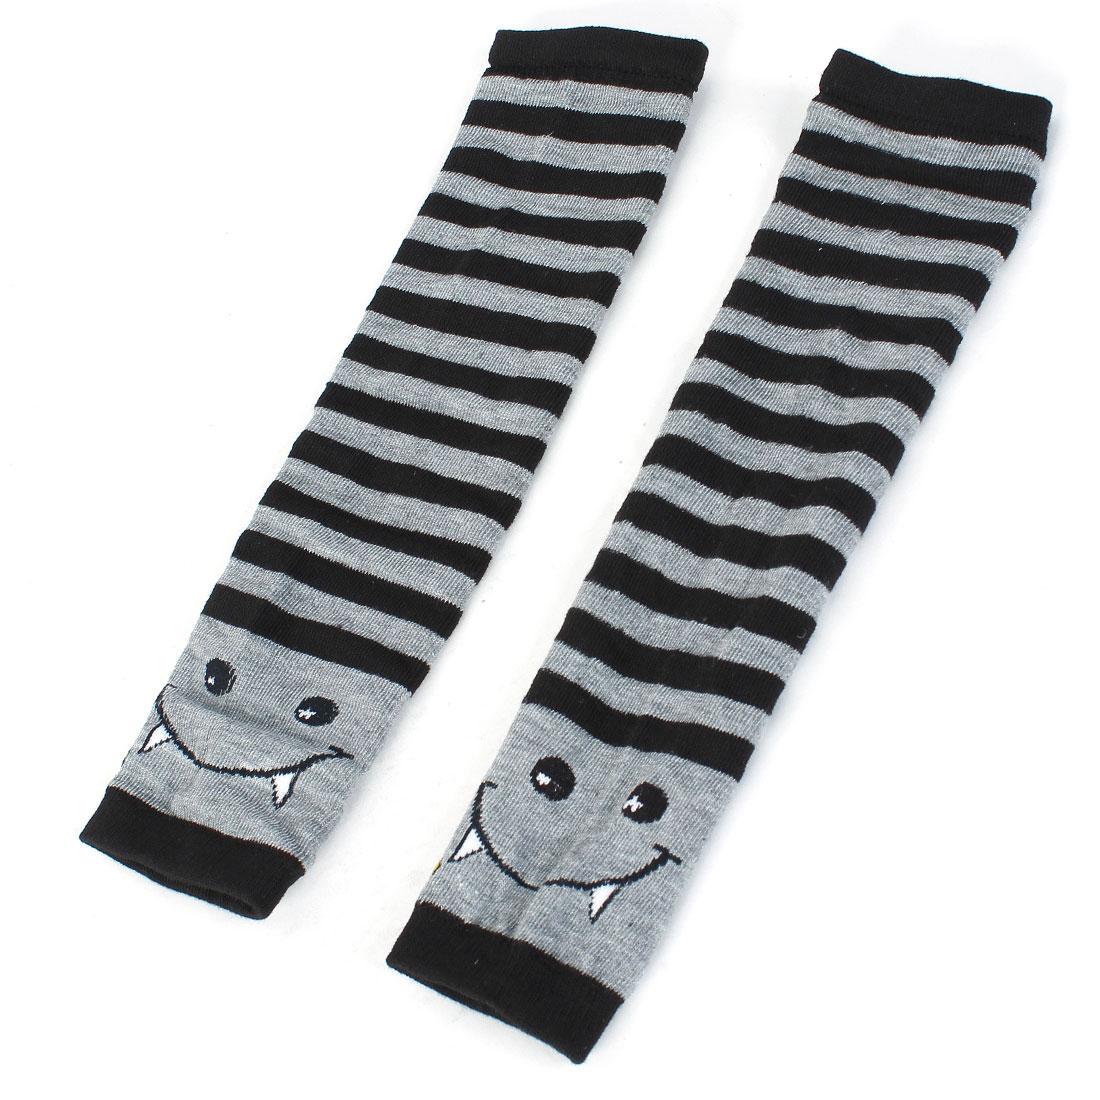 Ladies Striped Print Ribbing Winter Fingerless Arm Gloves Black Gray Pair